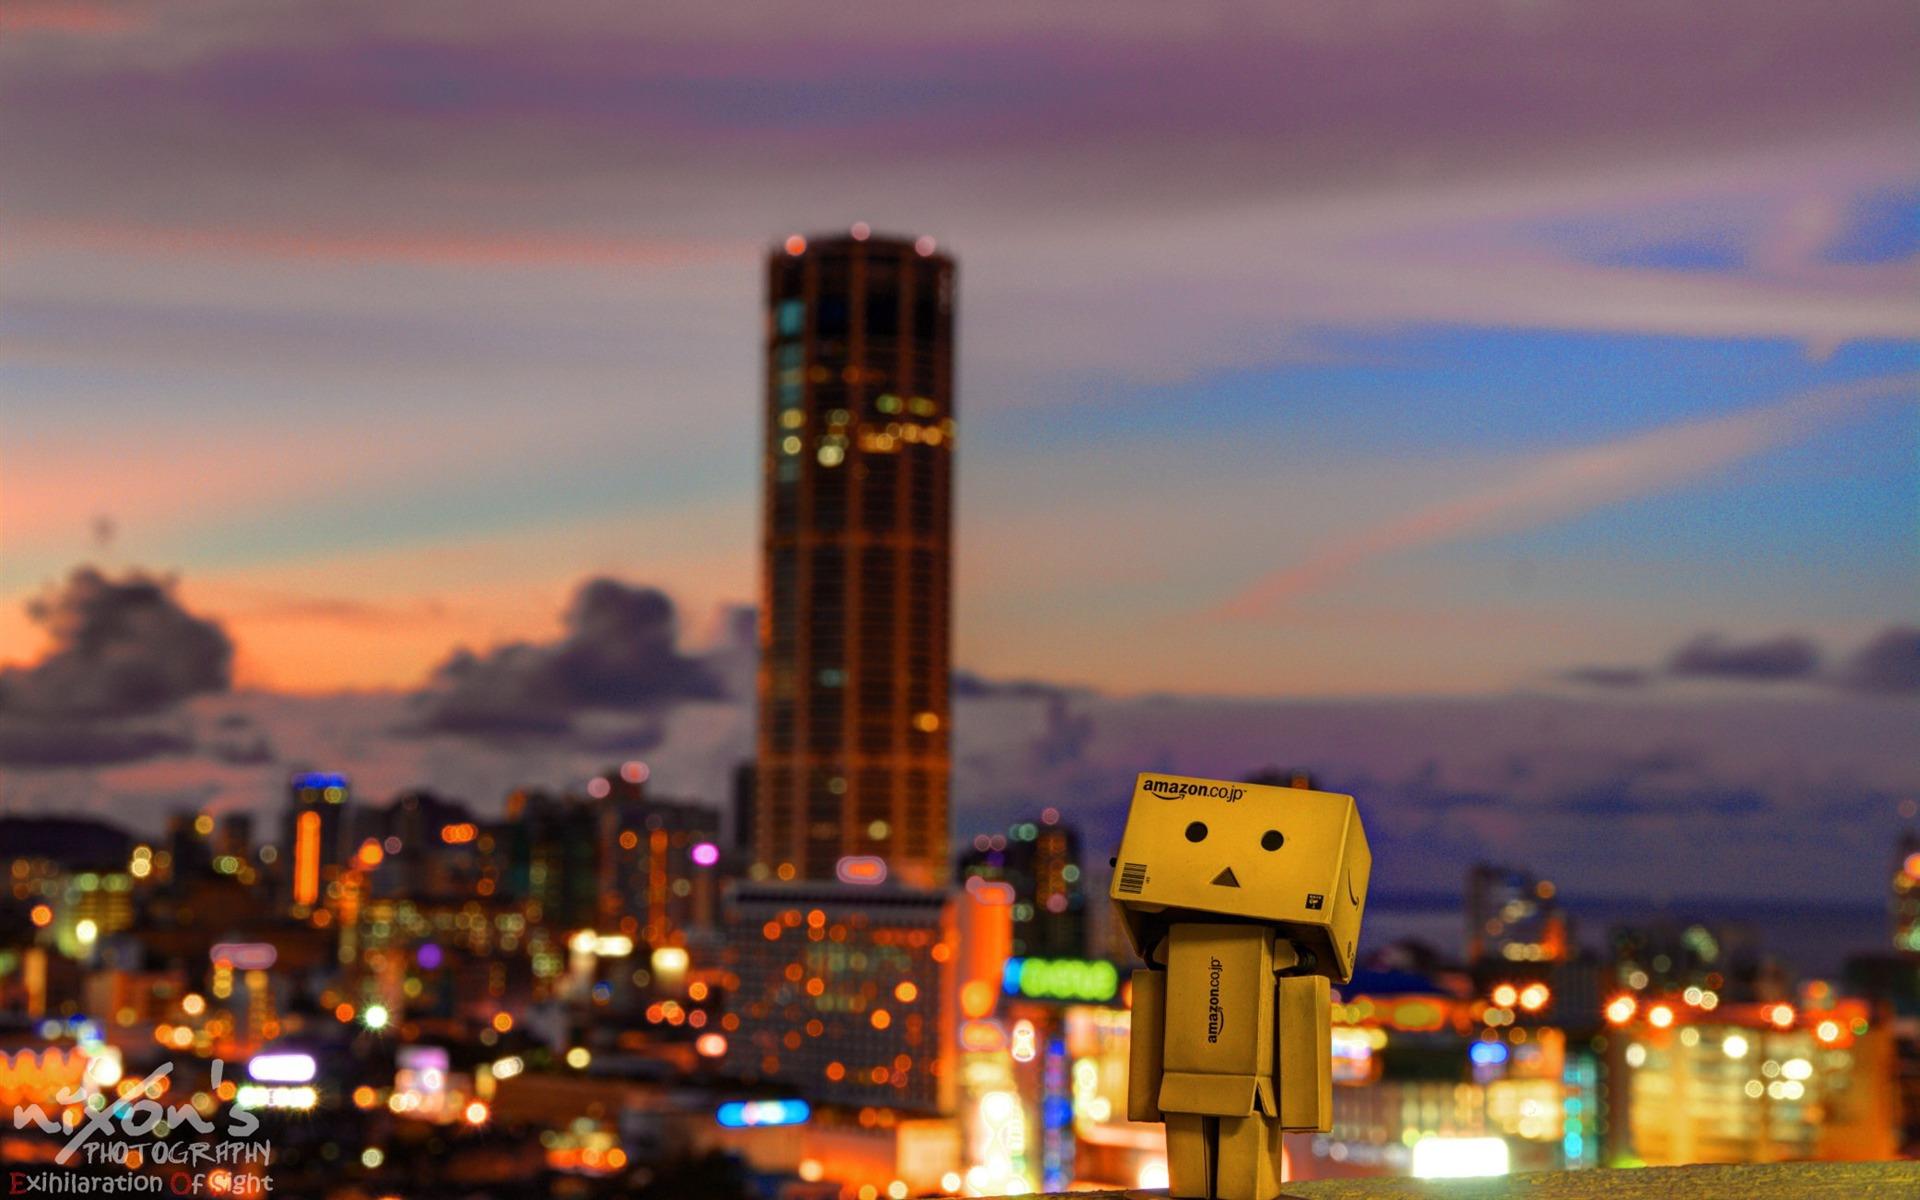 city sunset wallpaper 7106 - photo #6